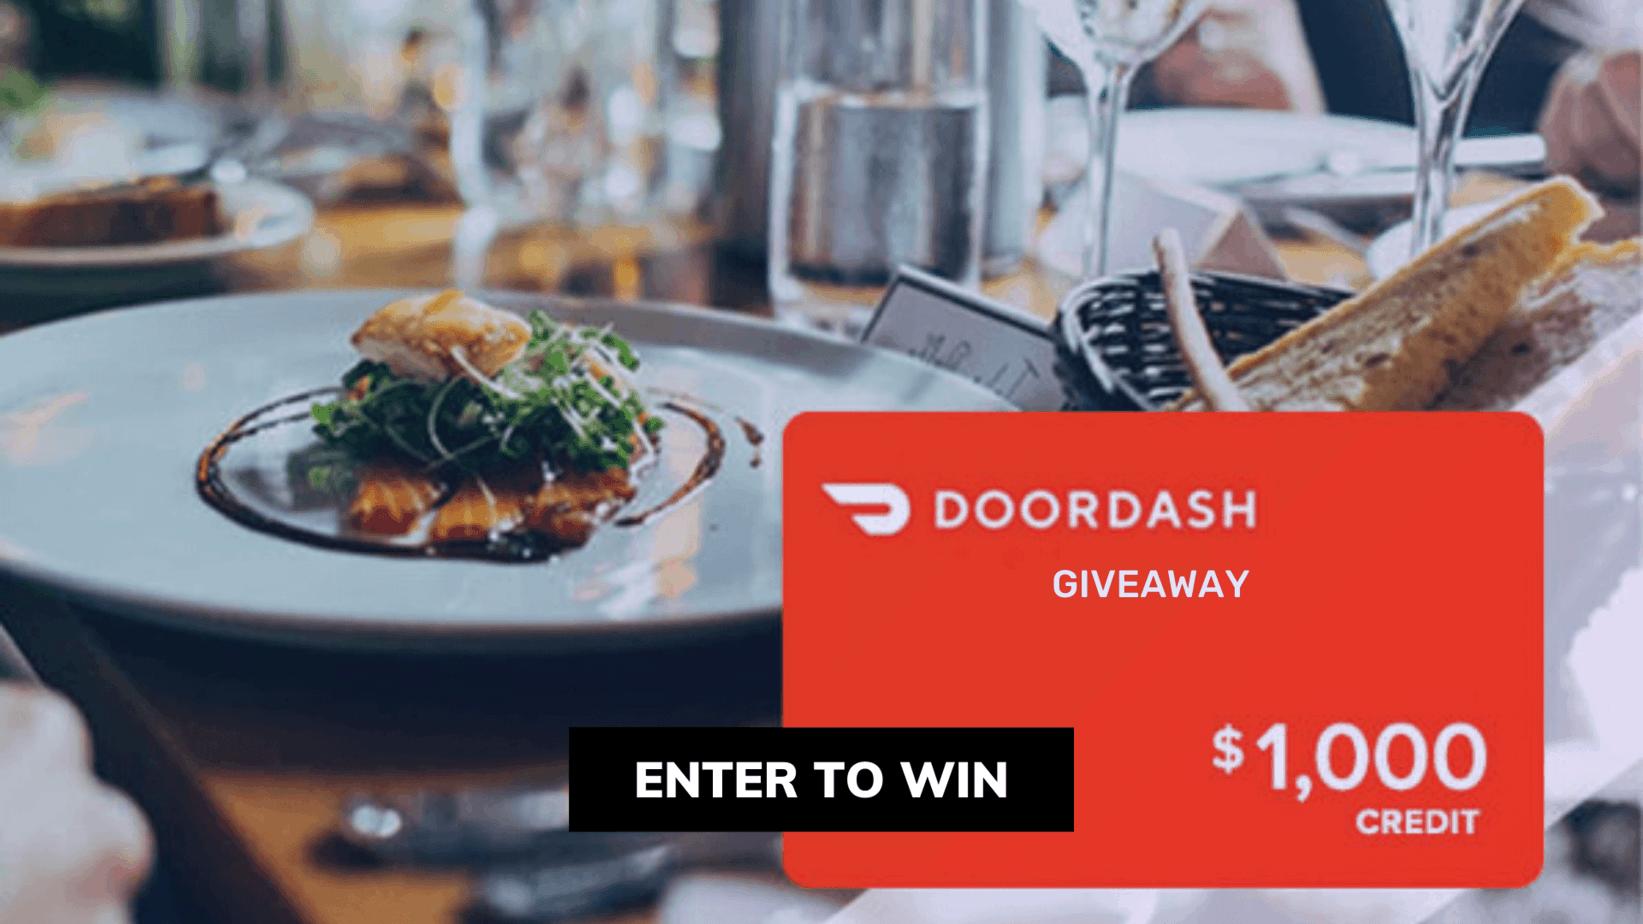 doordash-gift-card-giveaway (1)